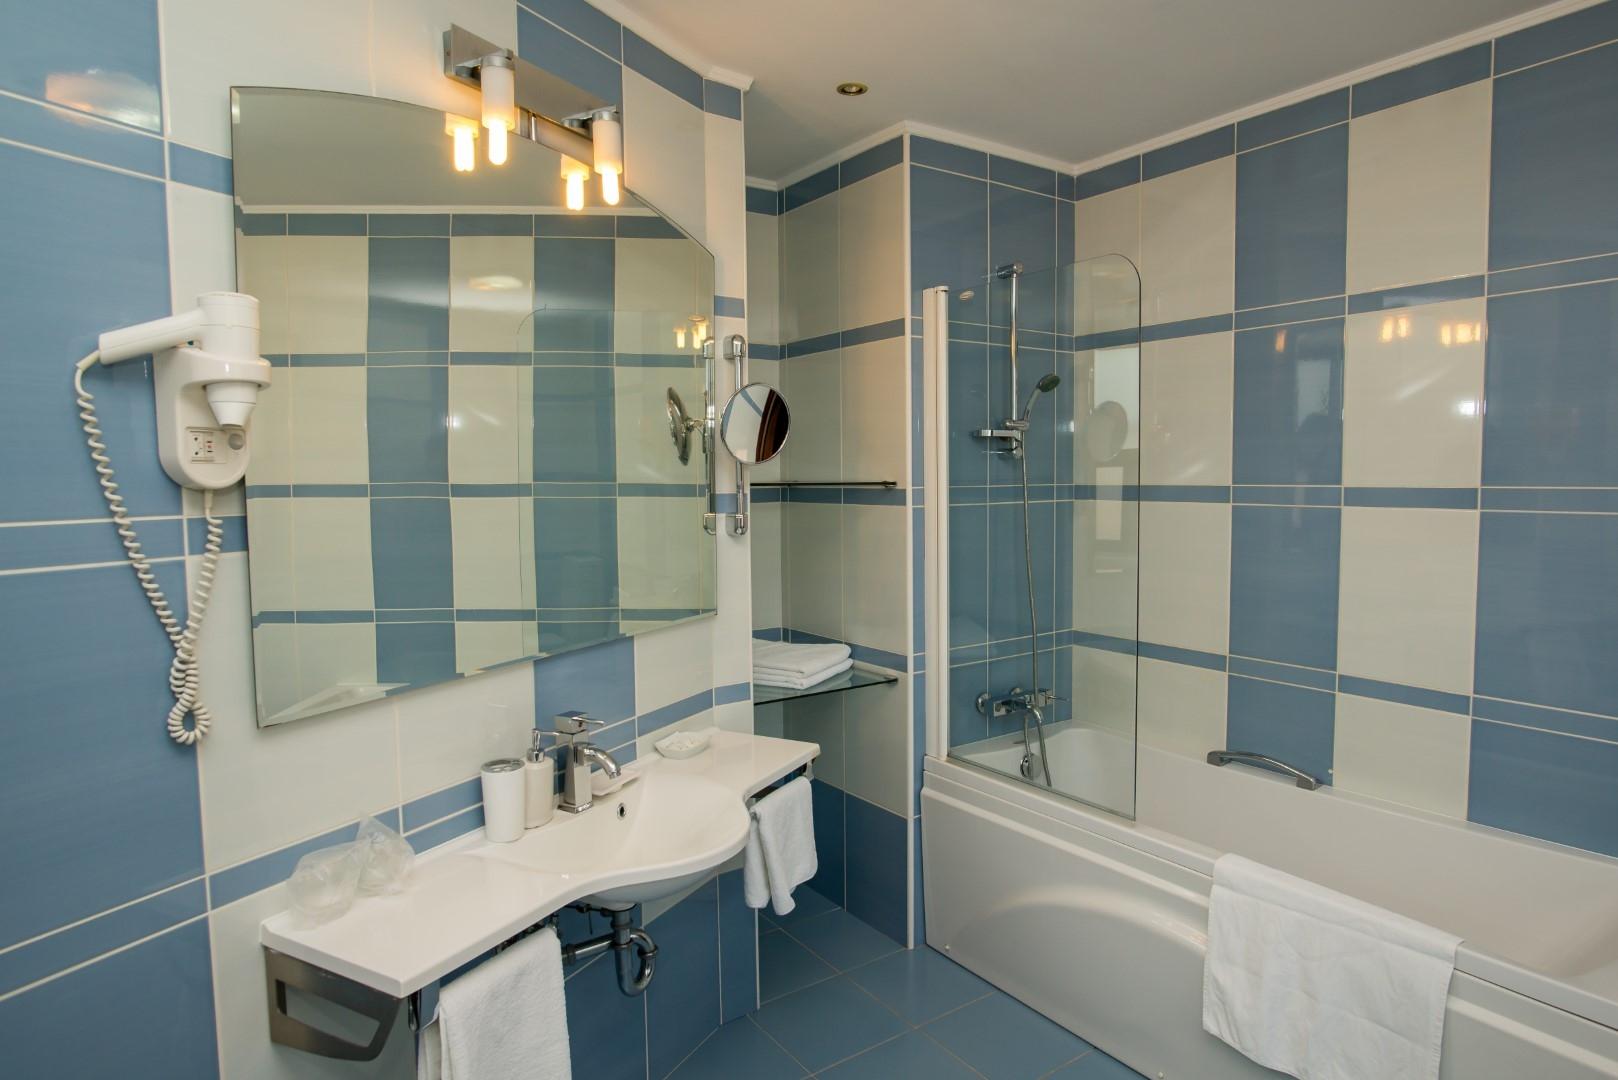 Camera dubla de lux